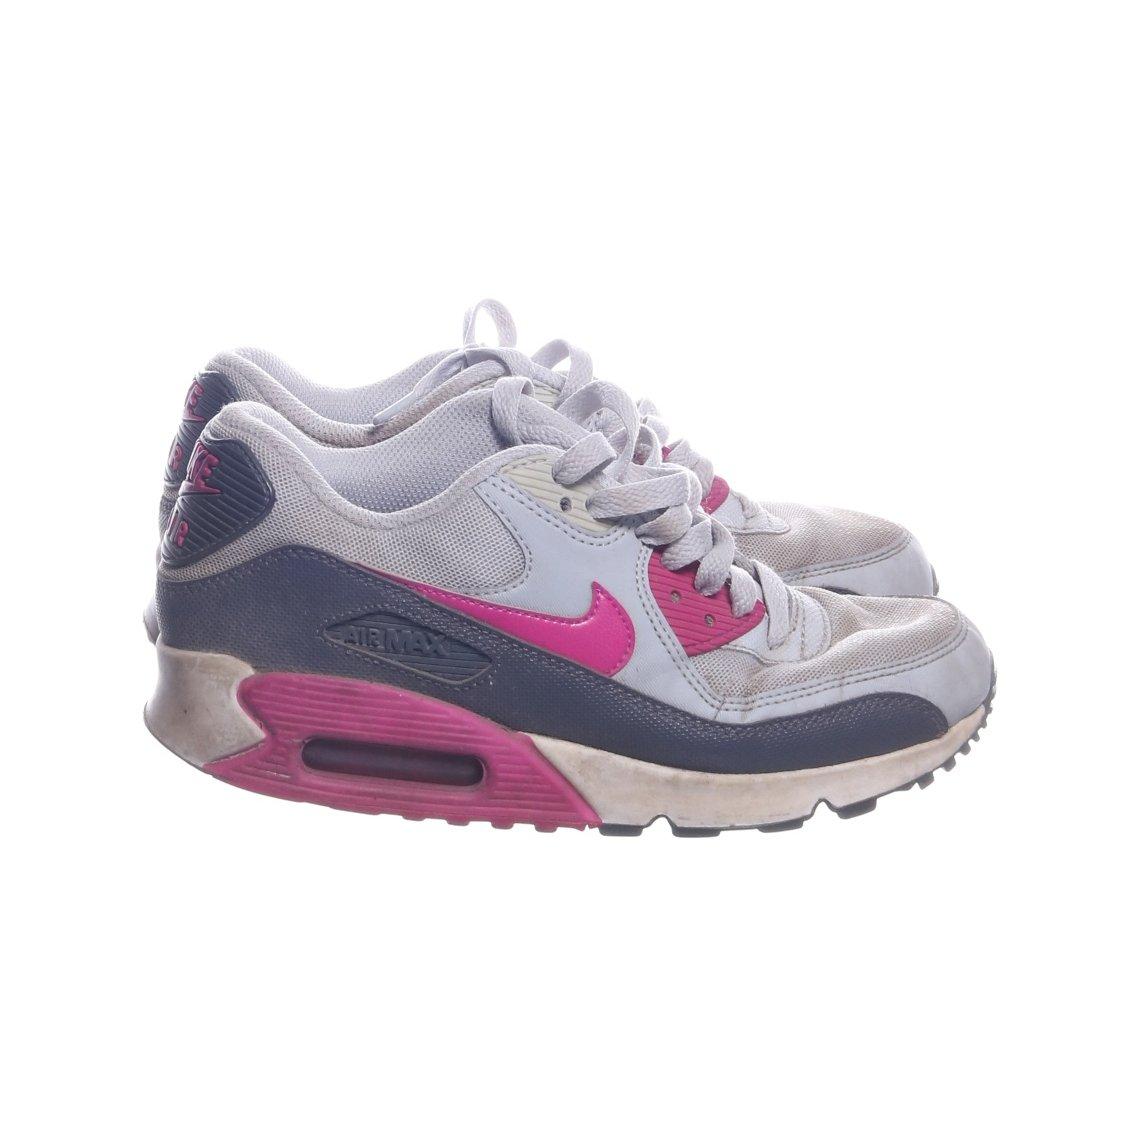 new styles b9a37 ea7ca Nike Air Max, Sneakers, Strl  37,5, Vit Rosa